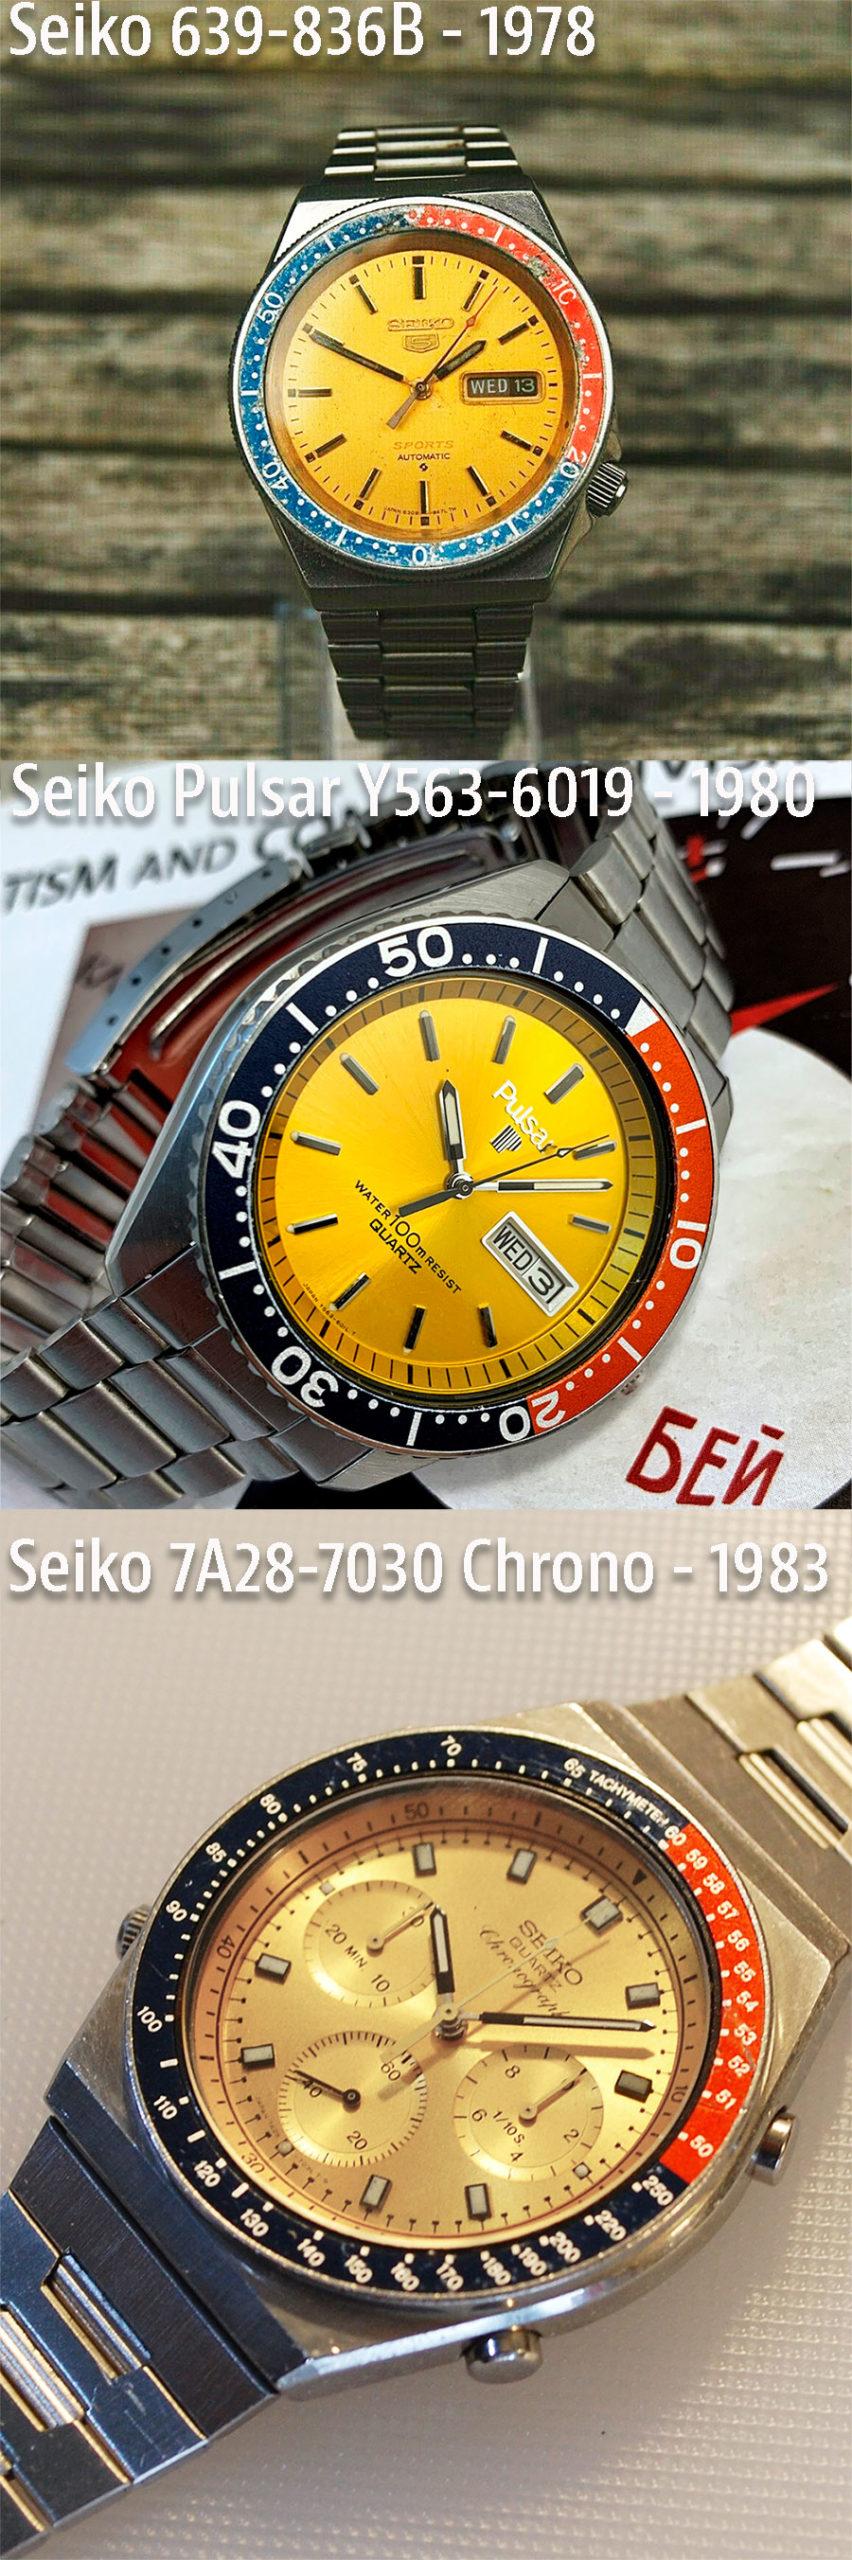 Seiko 6309-836B, Seiko Pulsar Y563-6019 y Seiko 7A28-7030 Chronograph